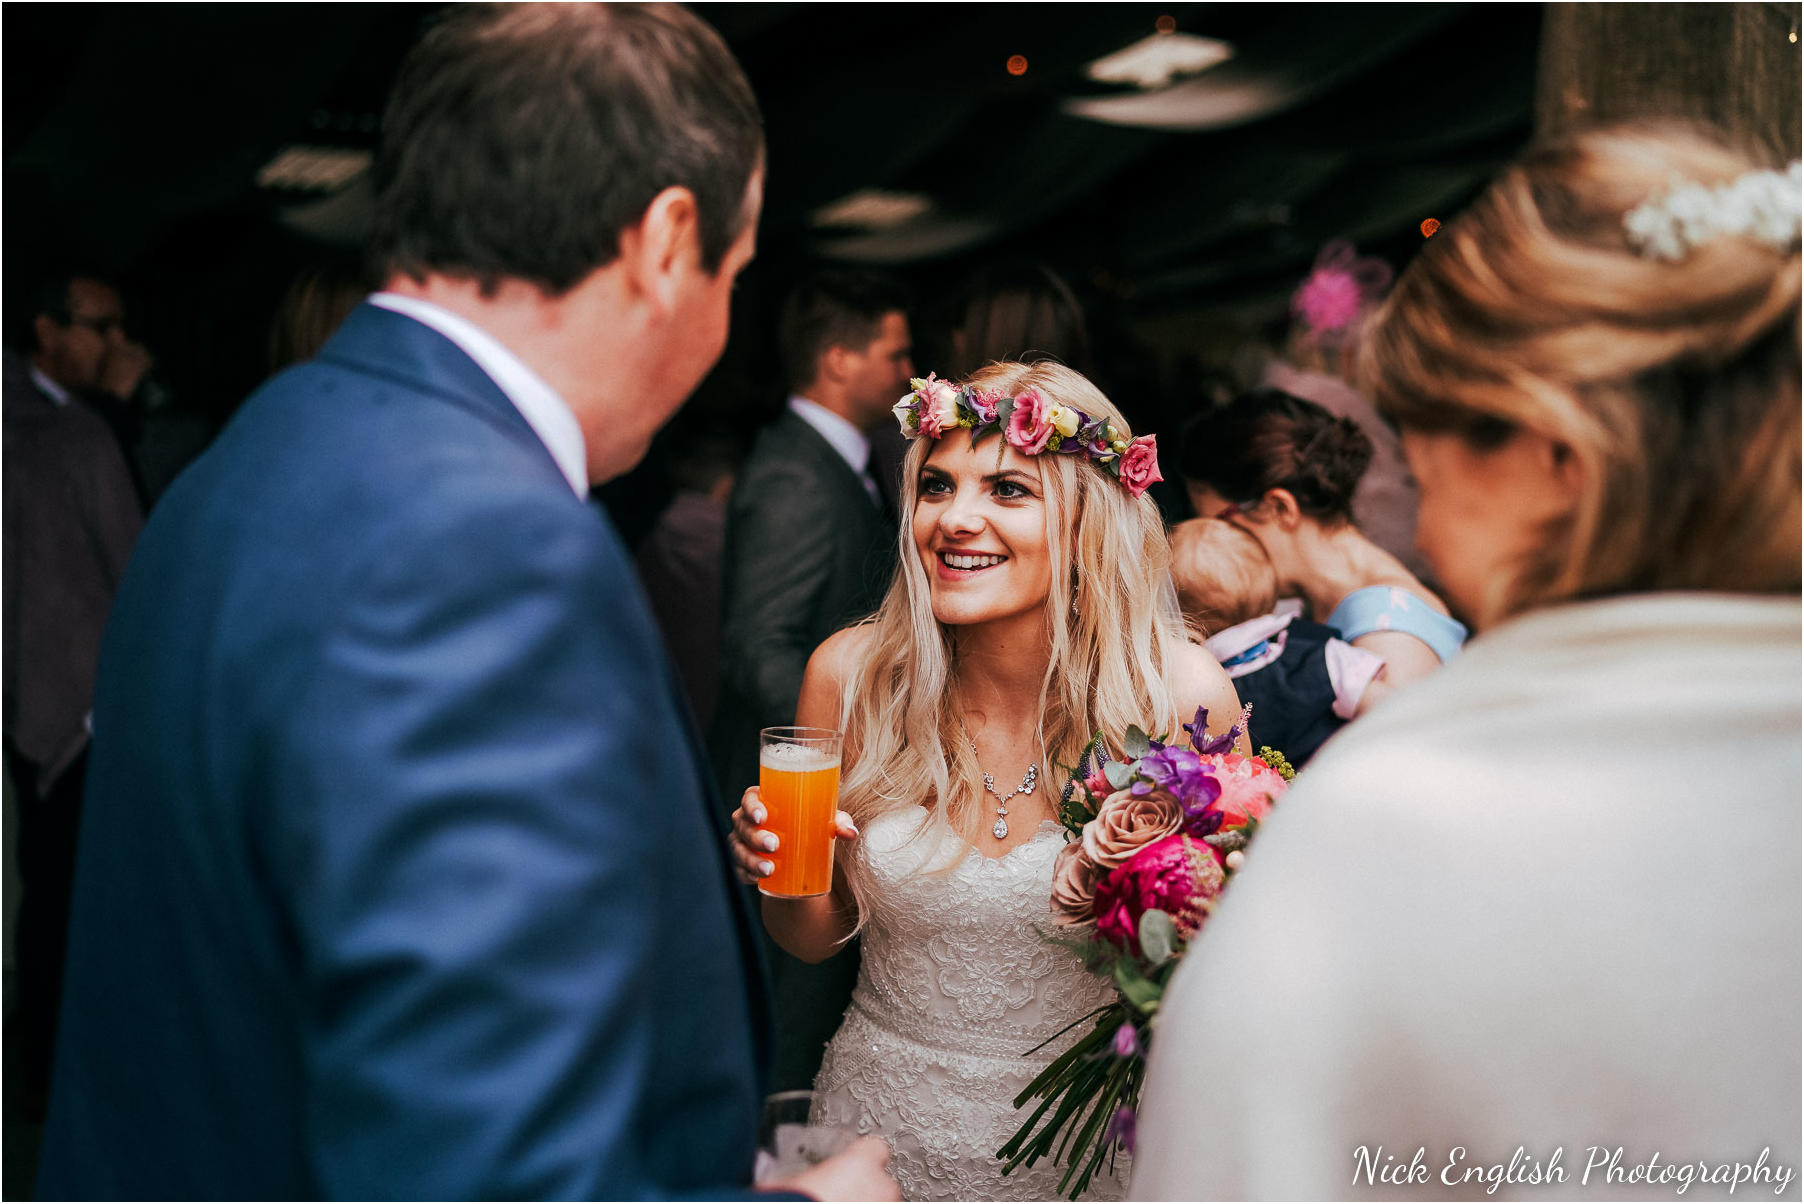 Whitebottom_Farm_Wedding_Manchester_Photograph-53.jpg